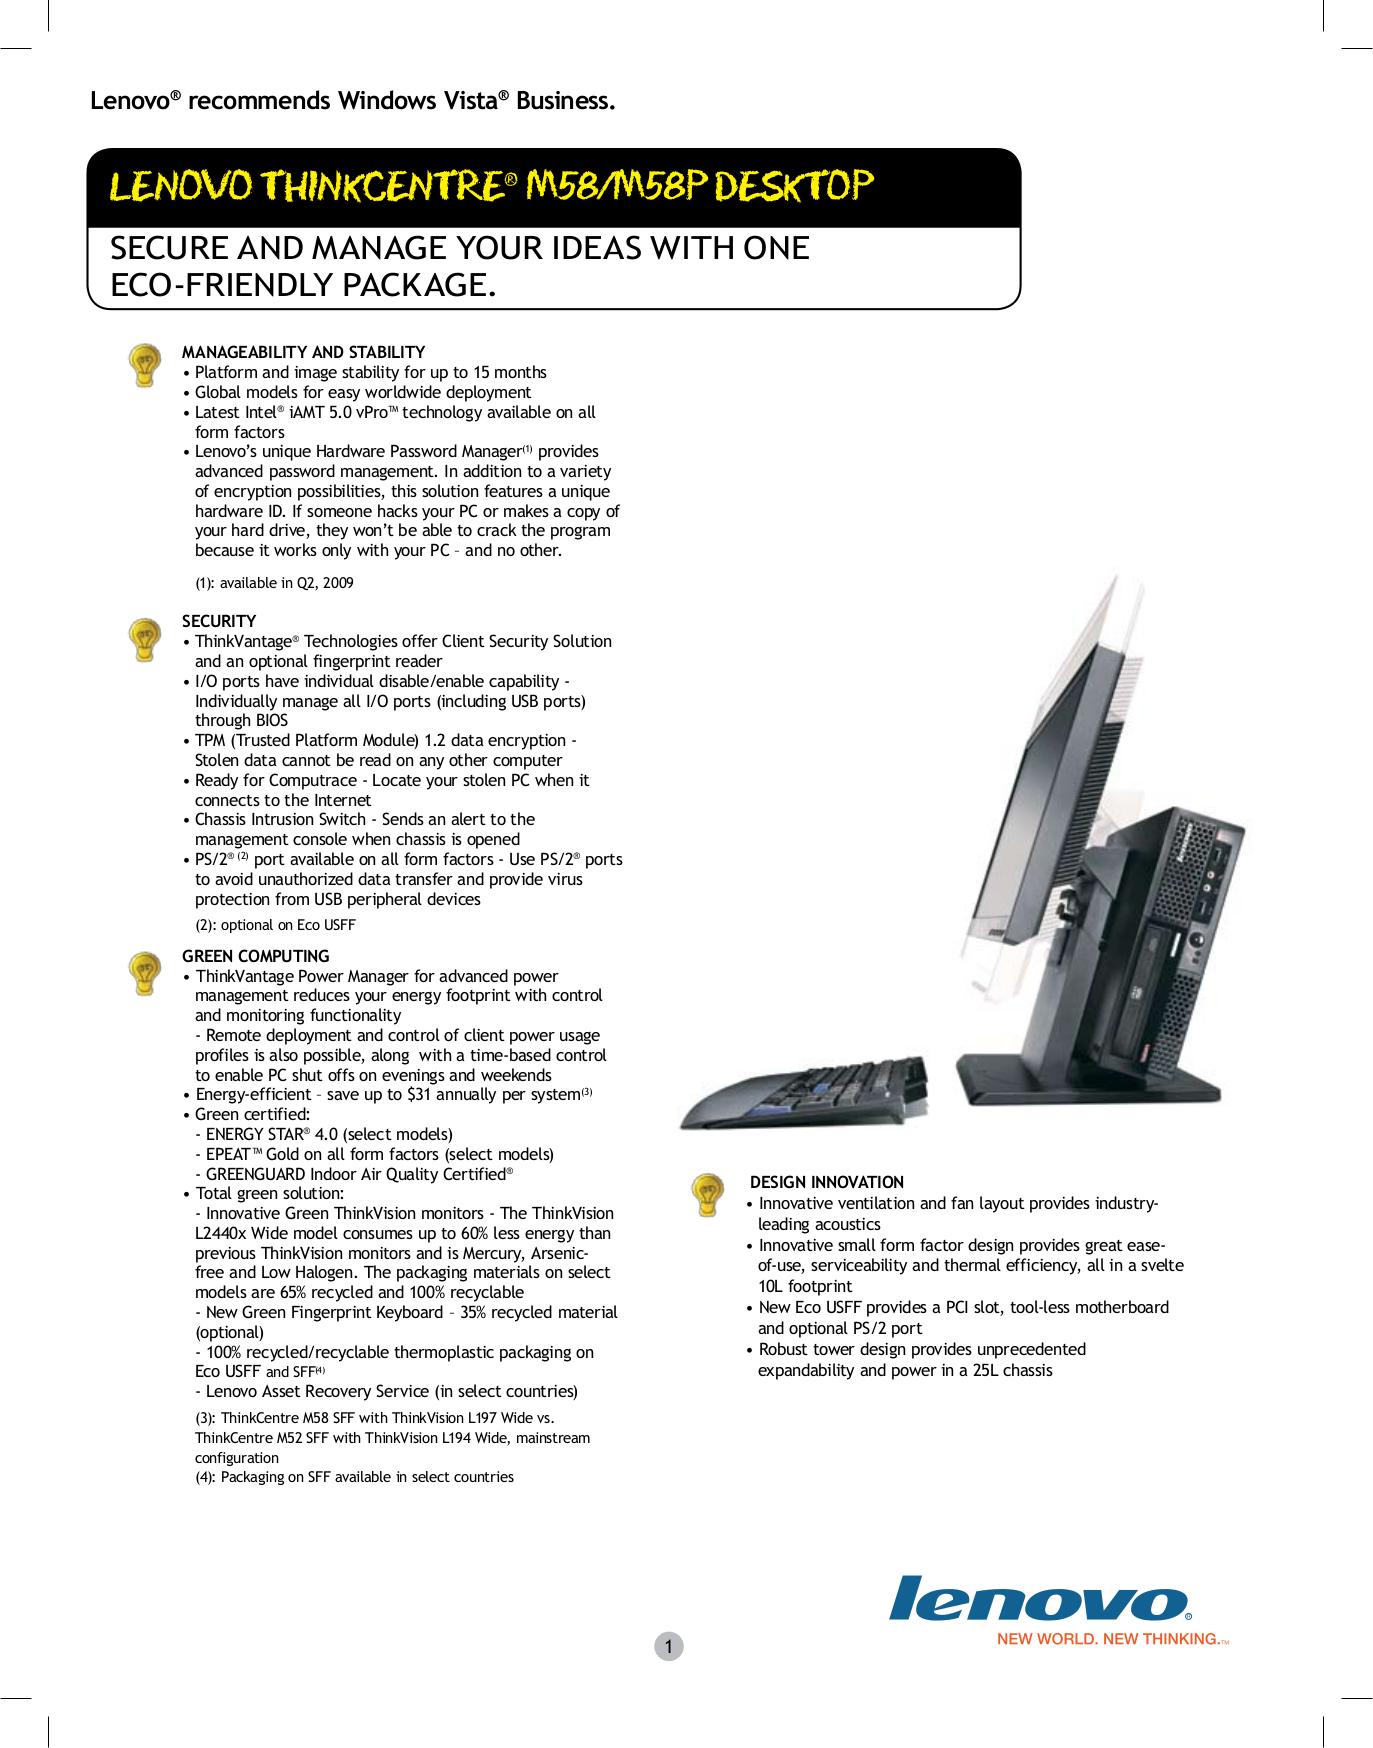 pdf for Lenovo Desktop ThinkCentre M58p 7345 manual